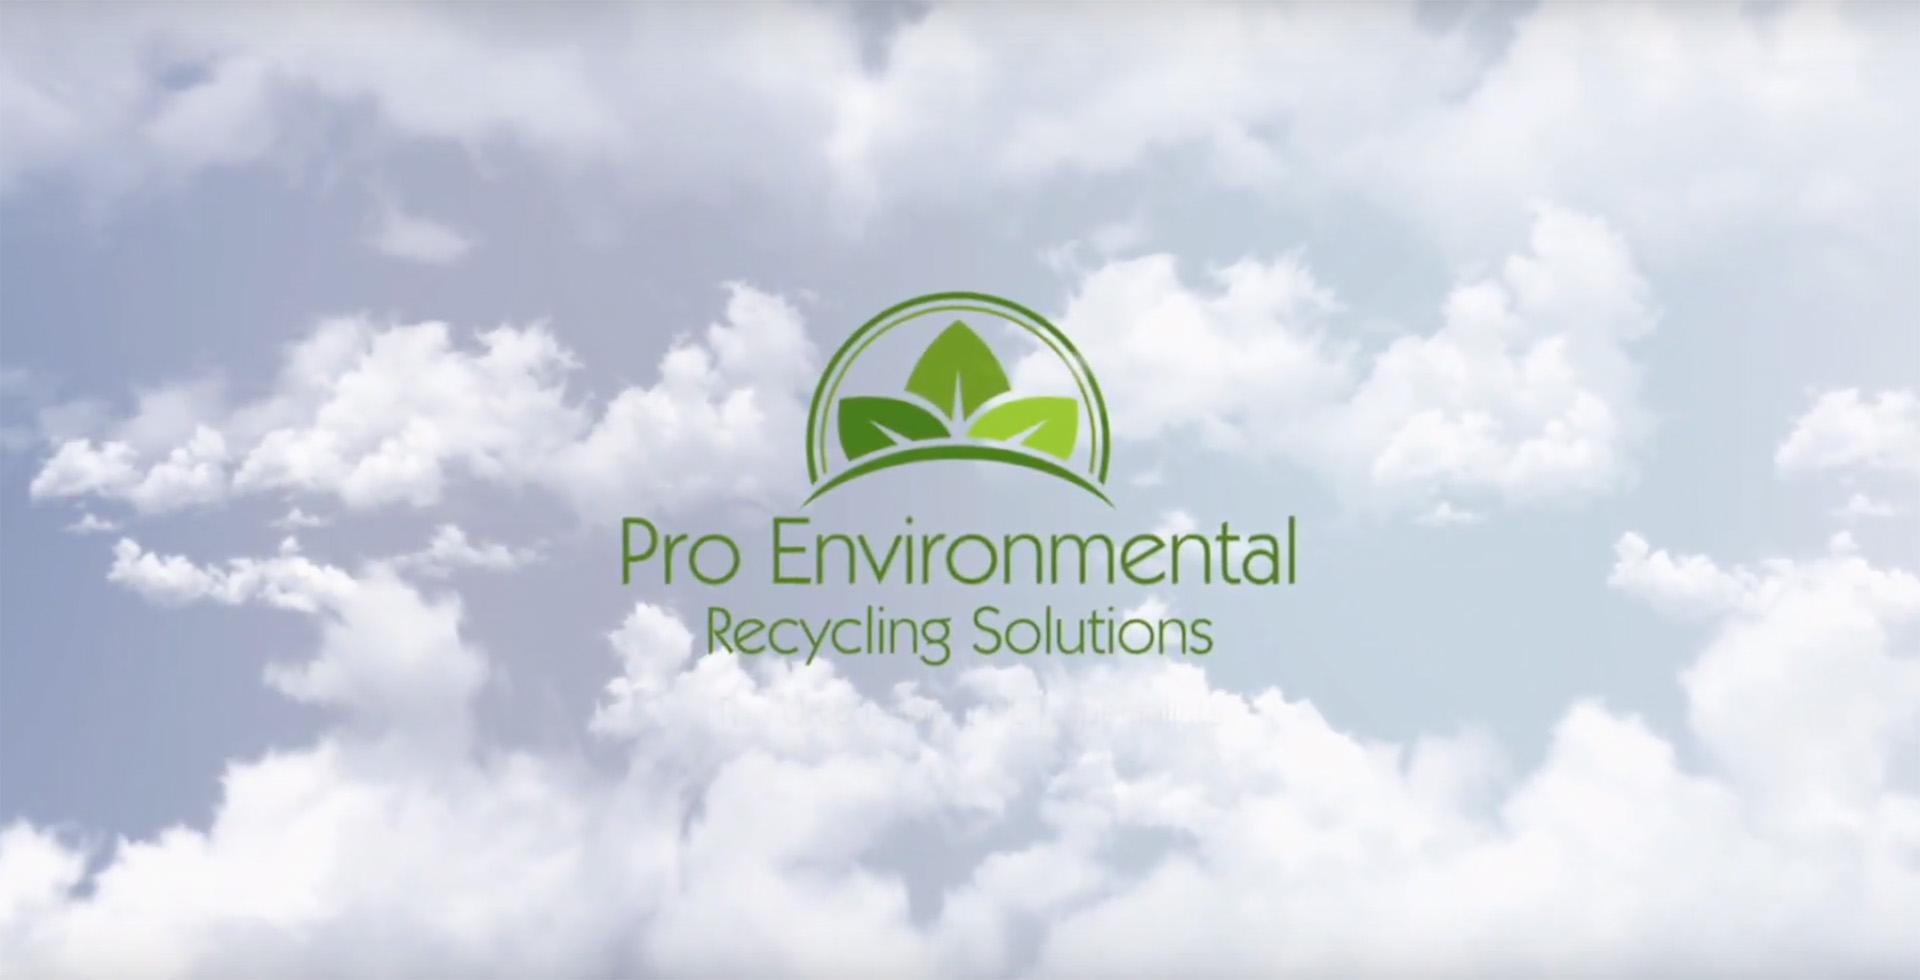 Pro Environmental Video Intro